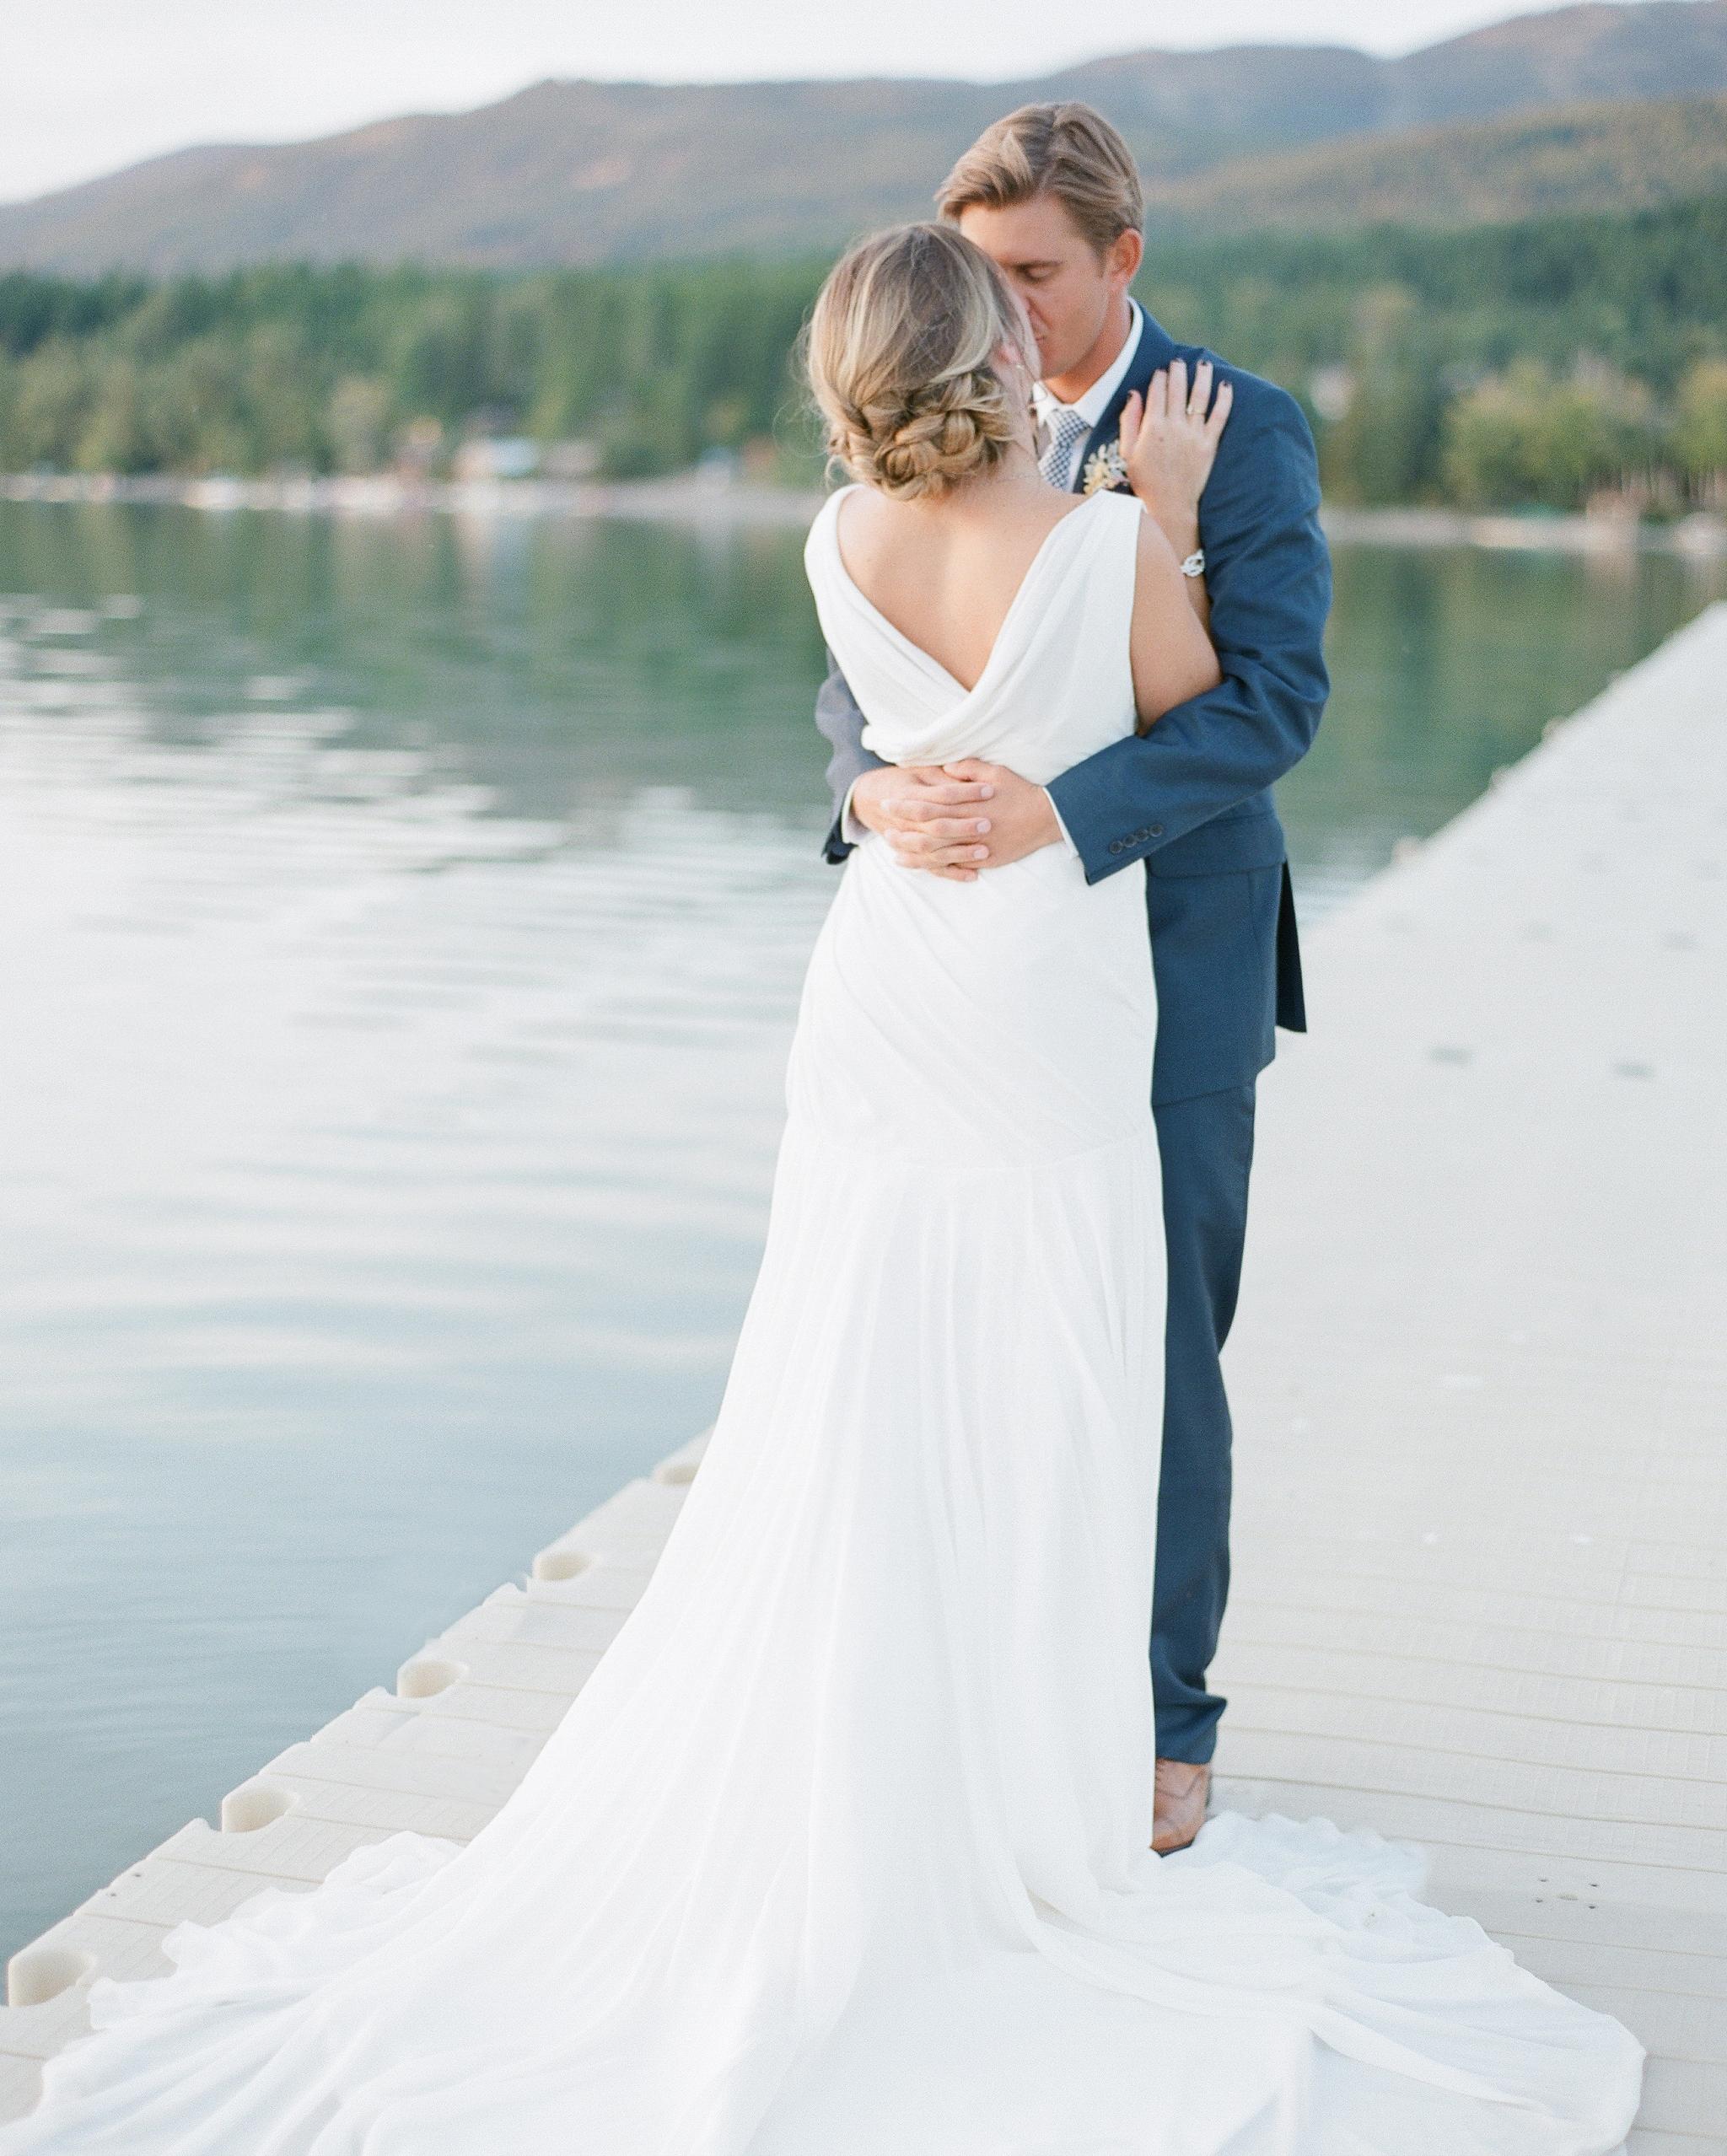 robin-kenny-wedding-couple-100-s112068-0715.jpg